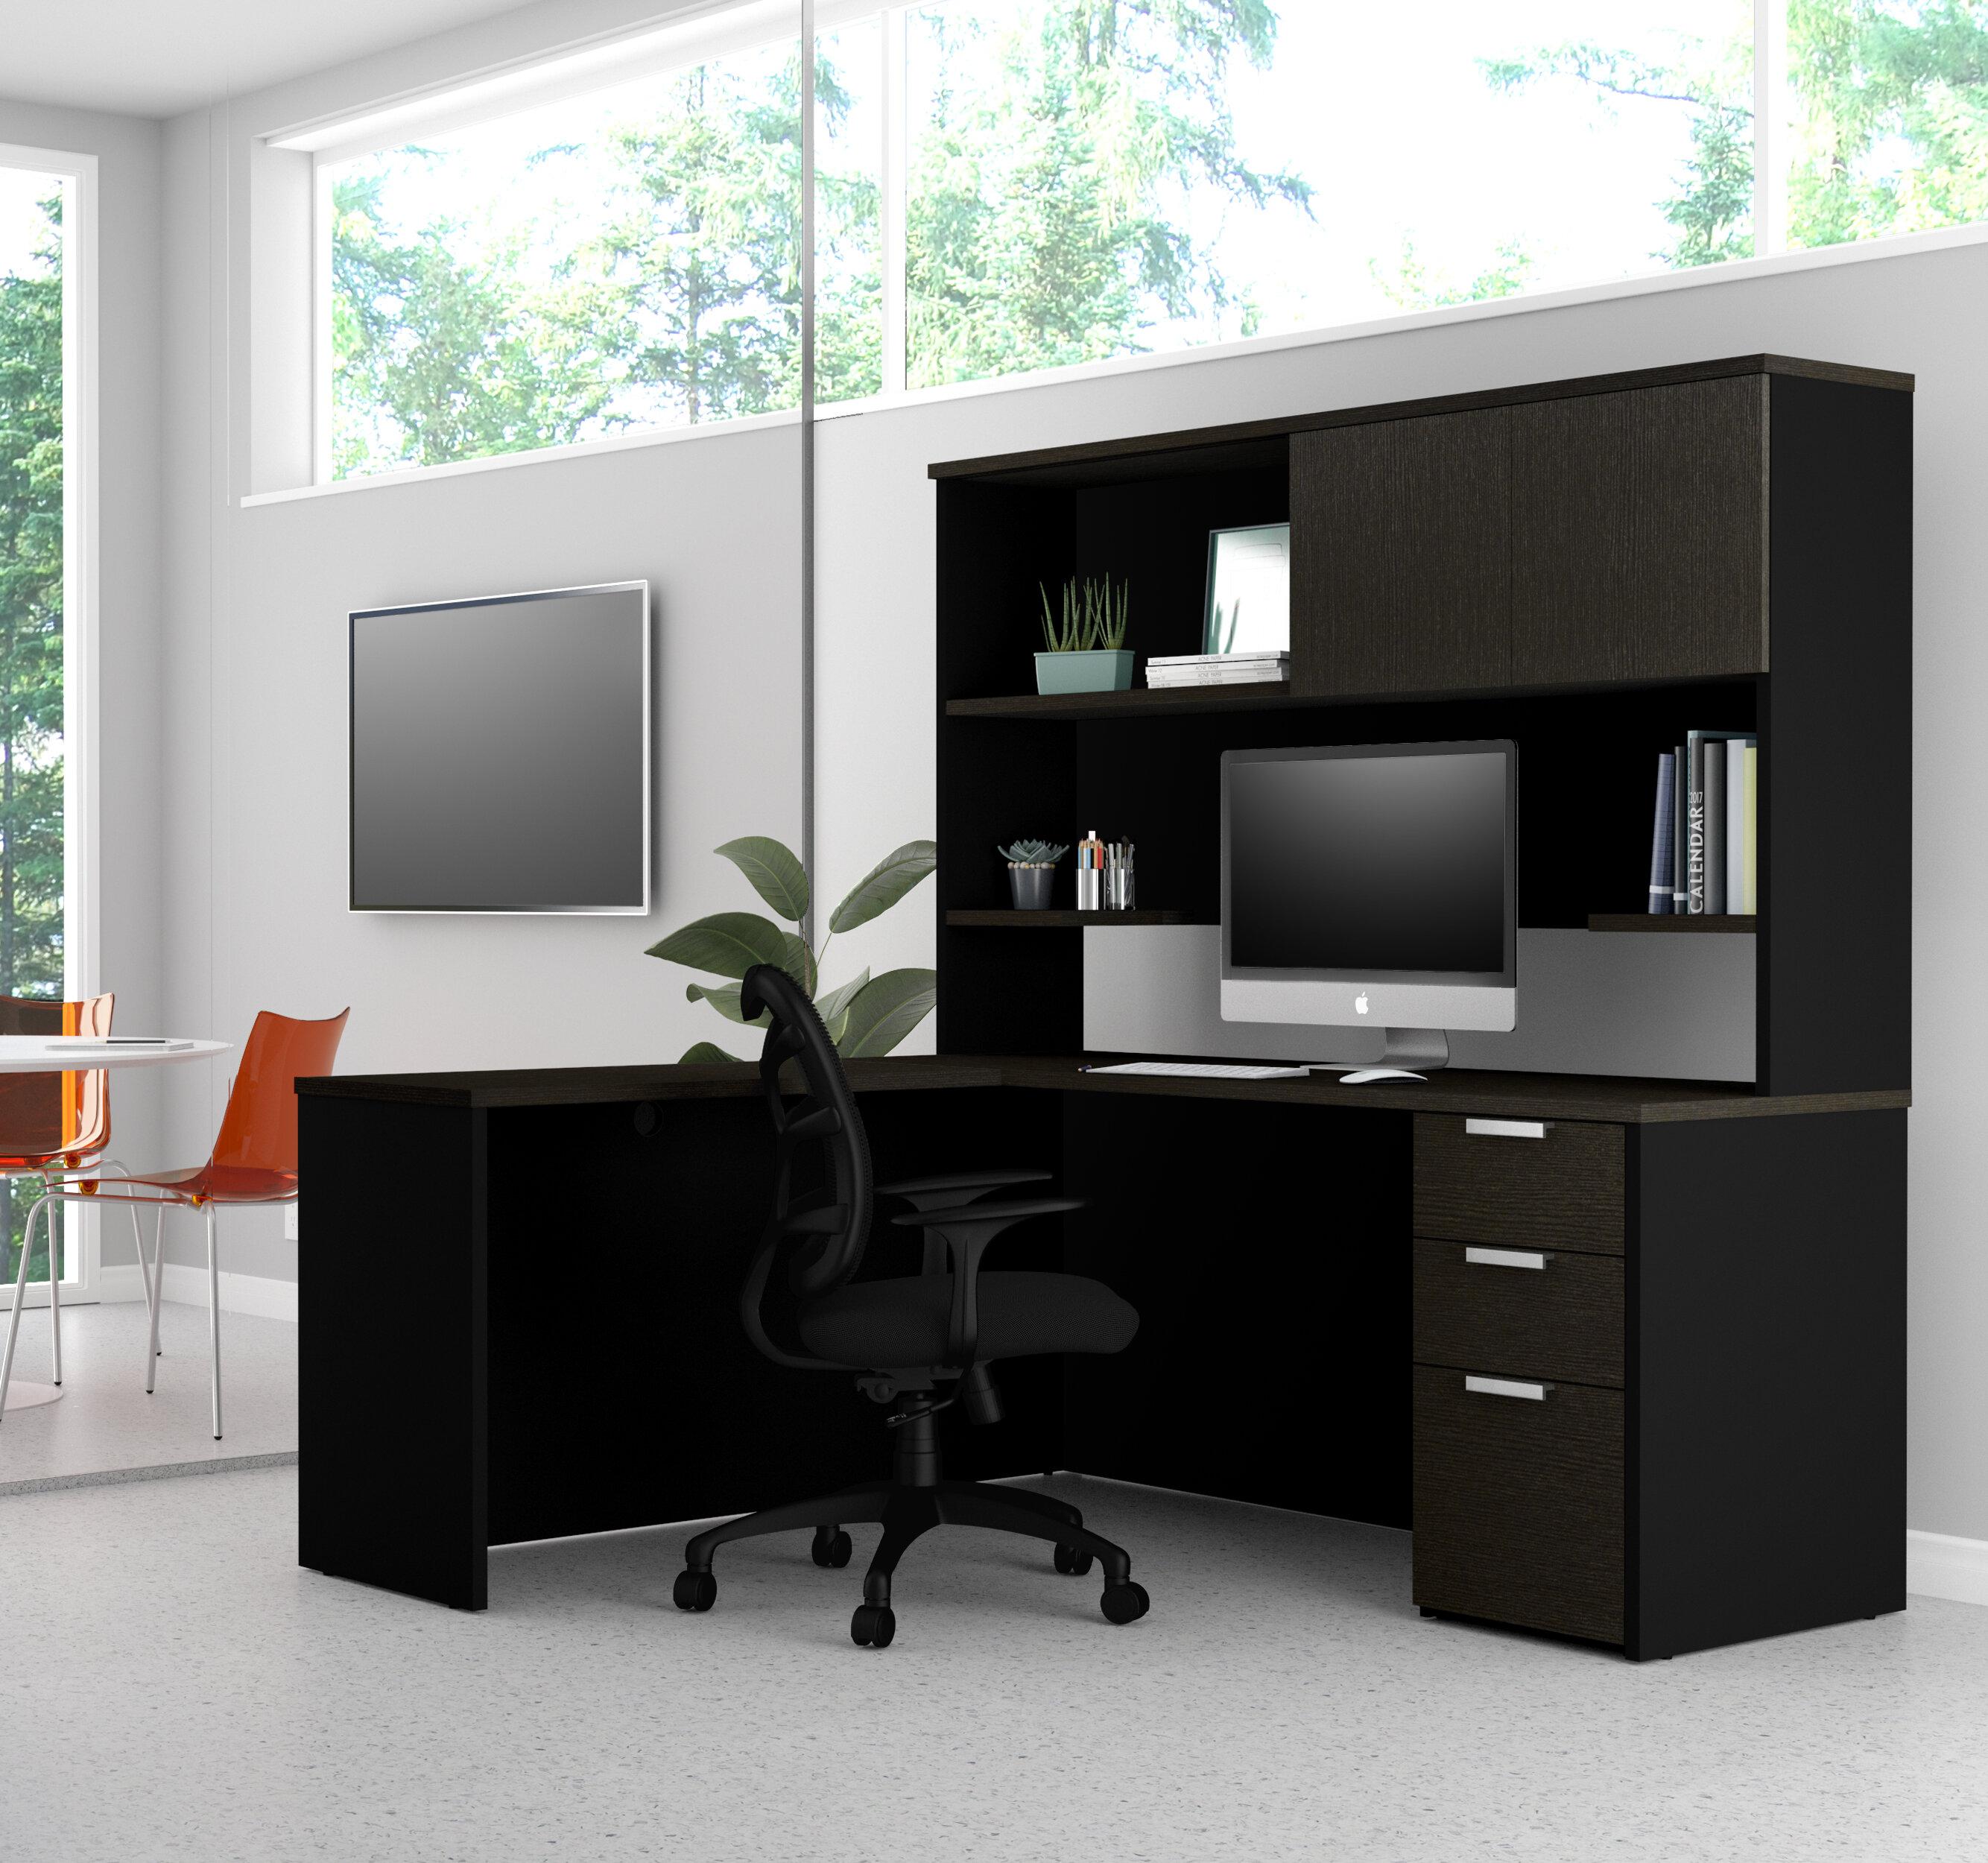 Miraculous Kadian Modern Reversible L Shape Corner Desk With Hutch Download Free Architecture Designs Scobabritishbridgeorg